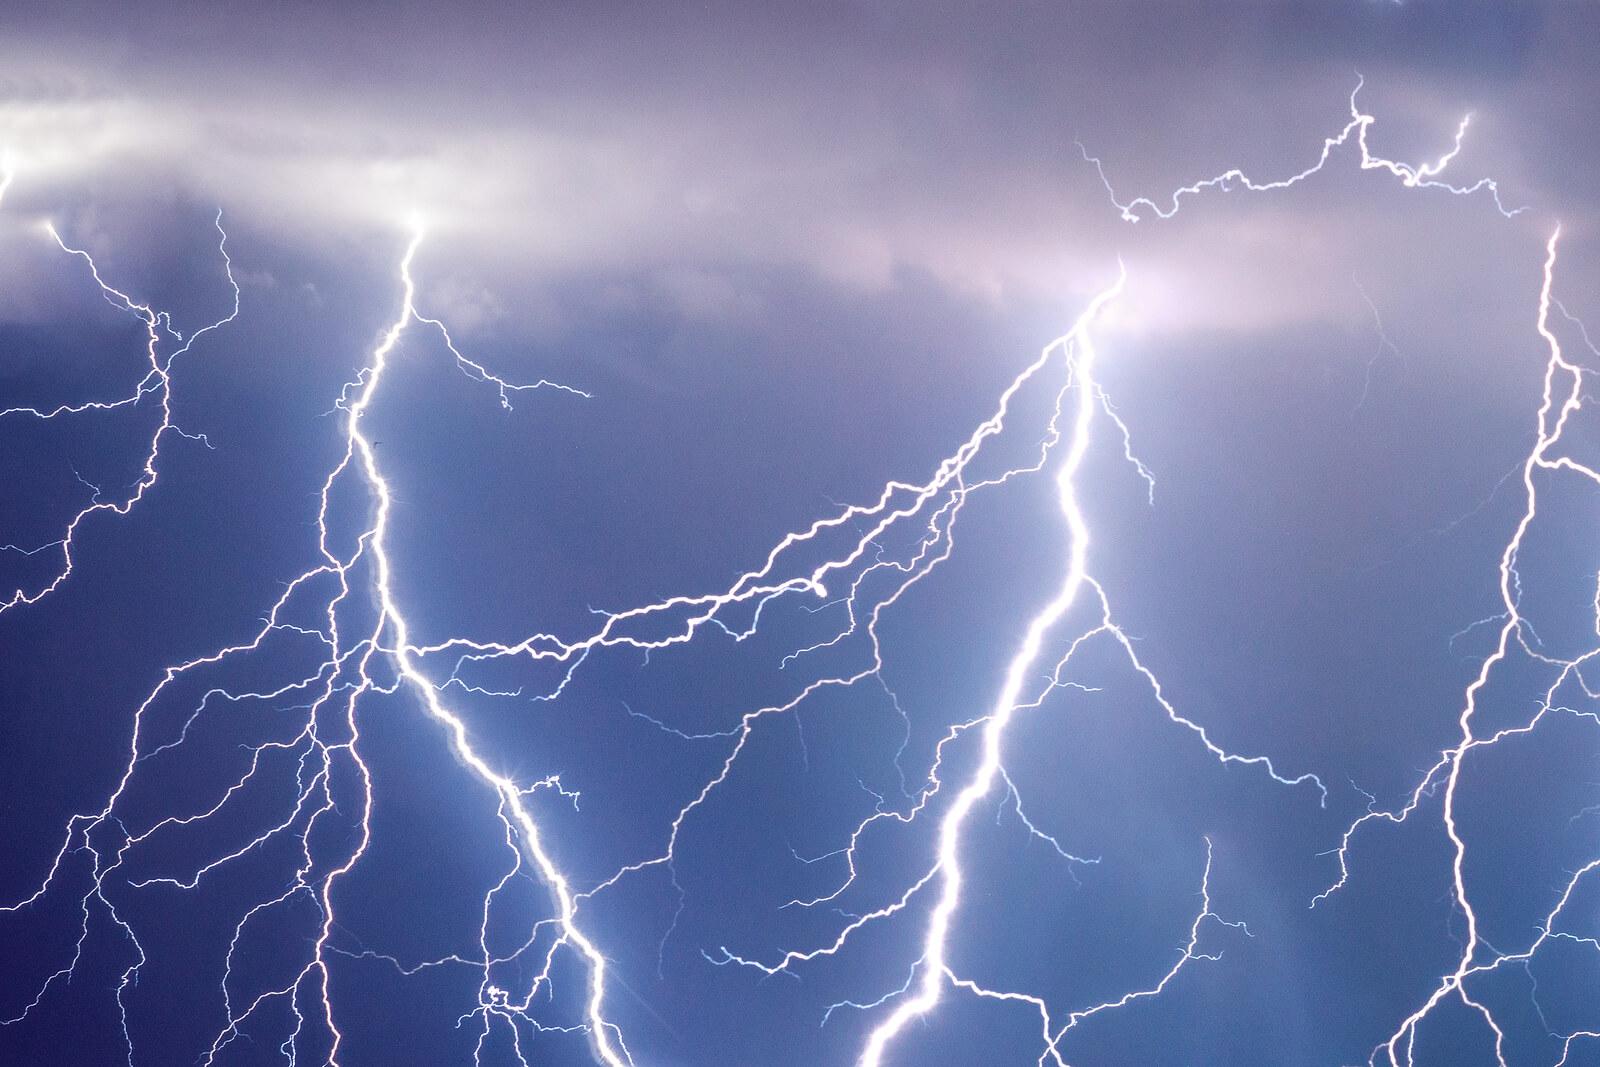 lightning strikes in a dark blue-gray strike